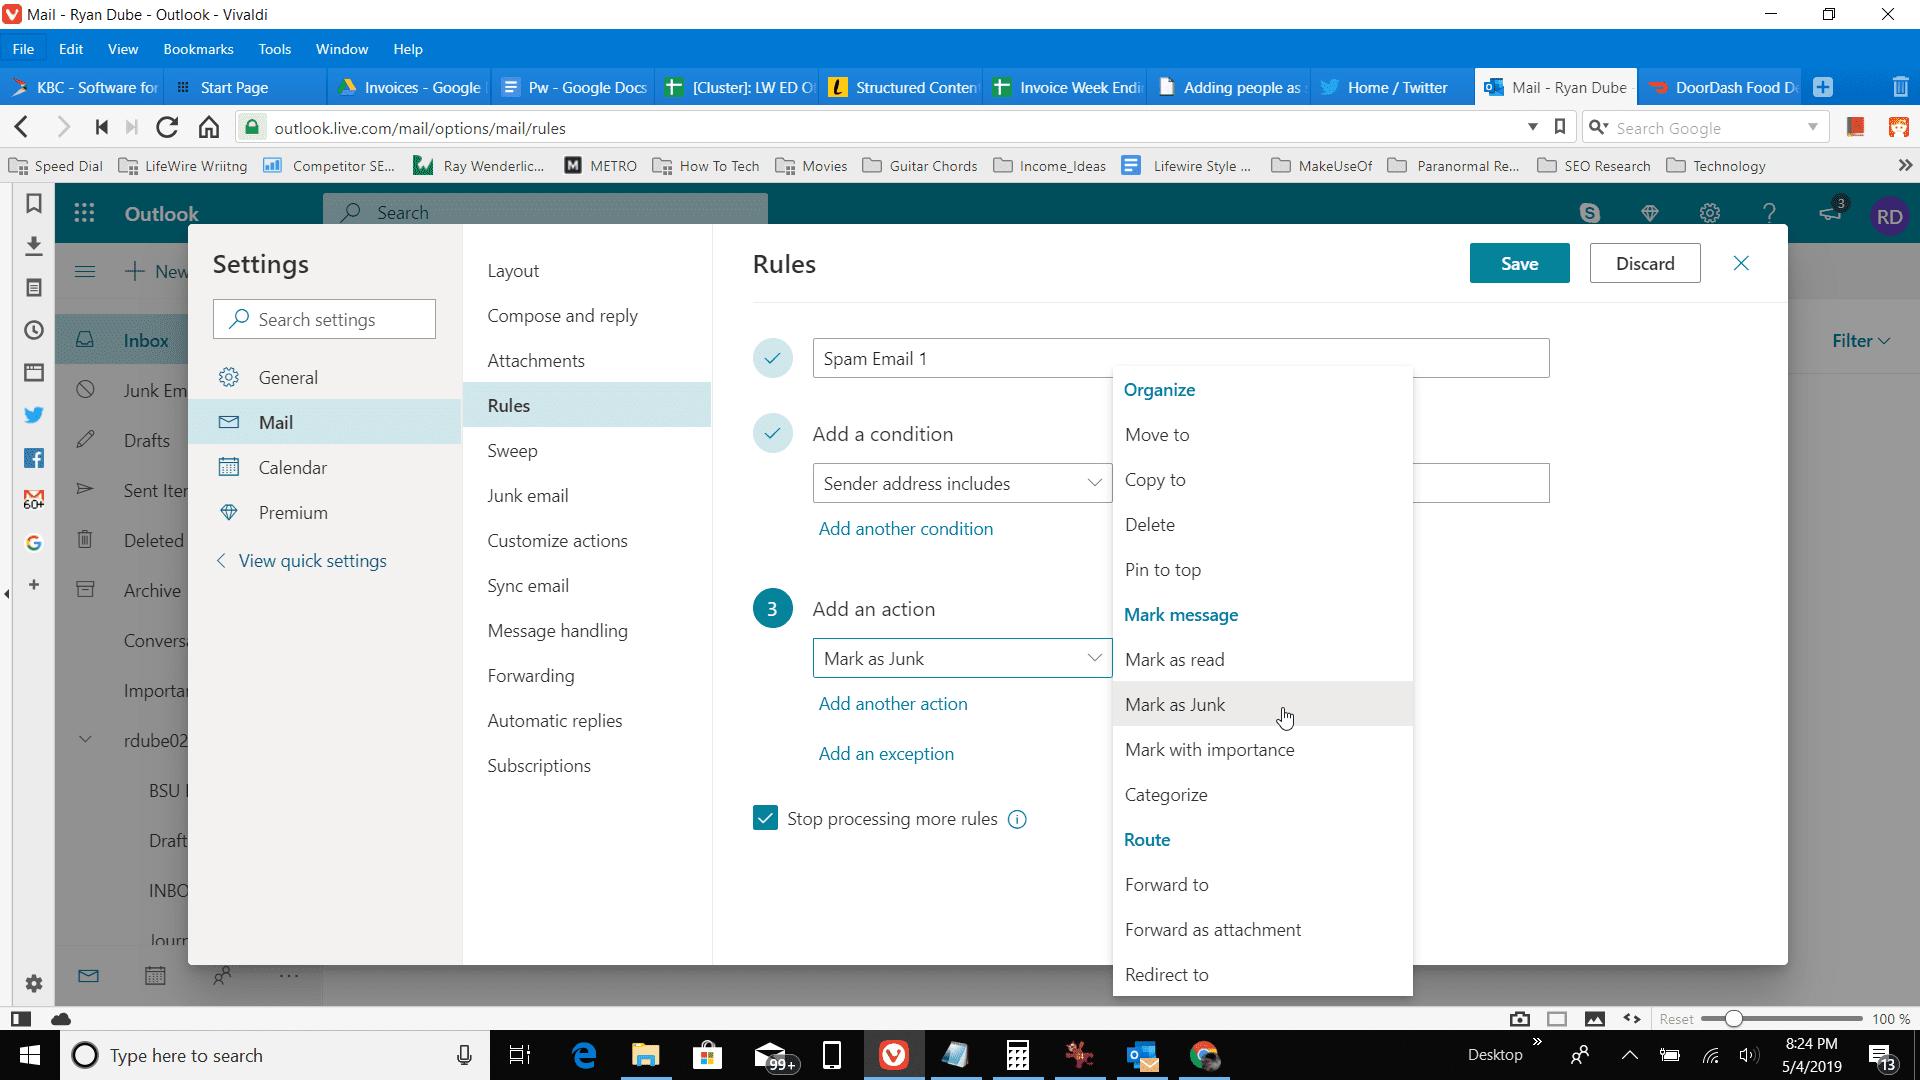 Screenshot of Mark as junk in Outlook online